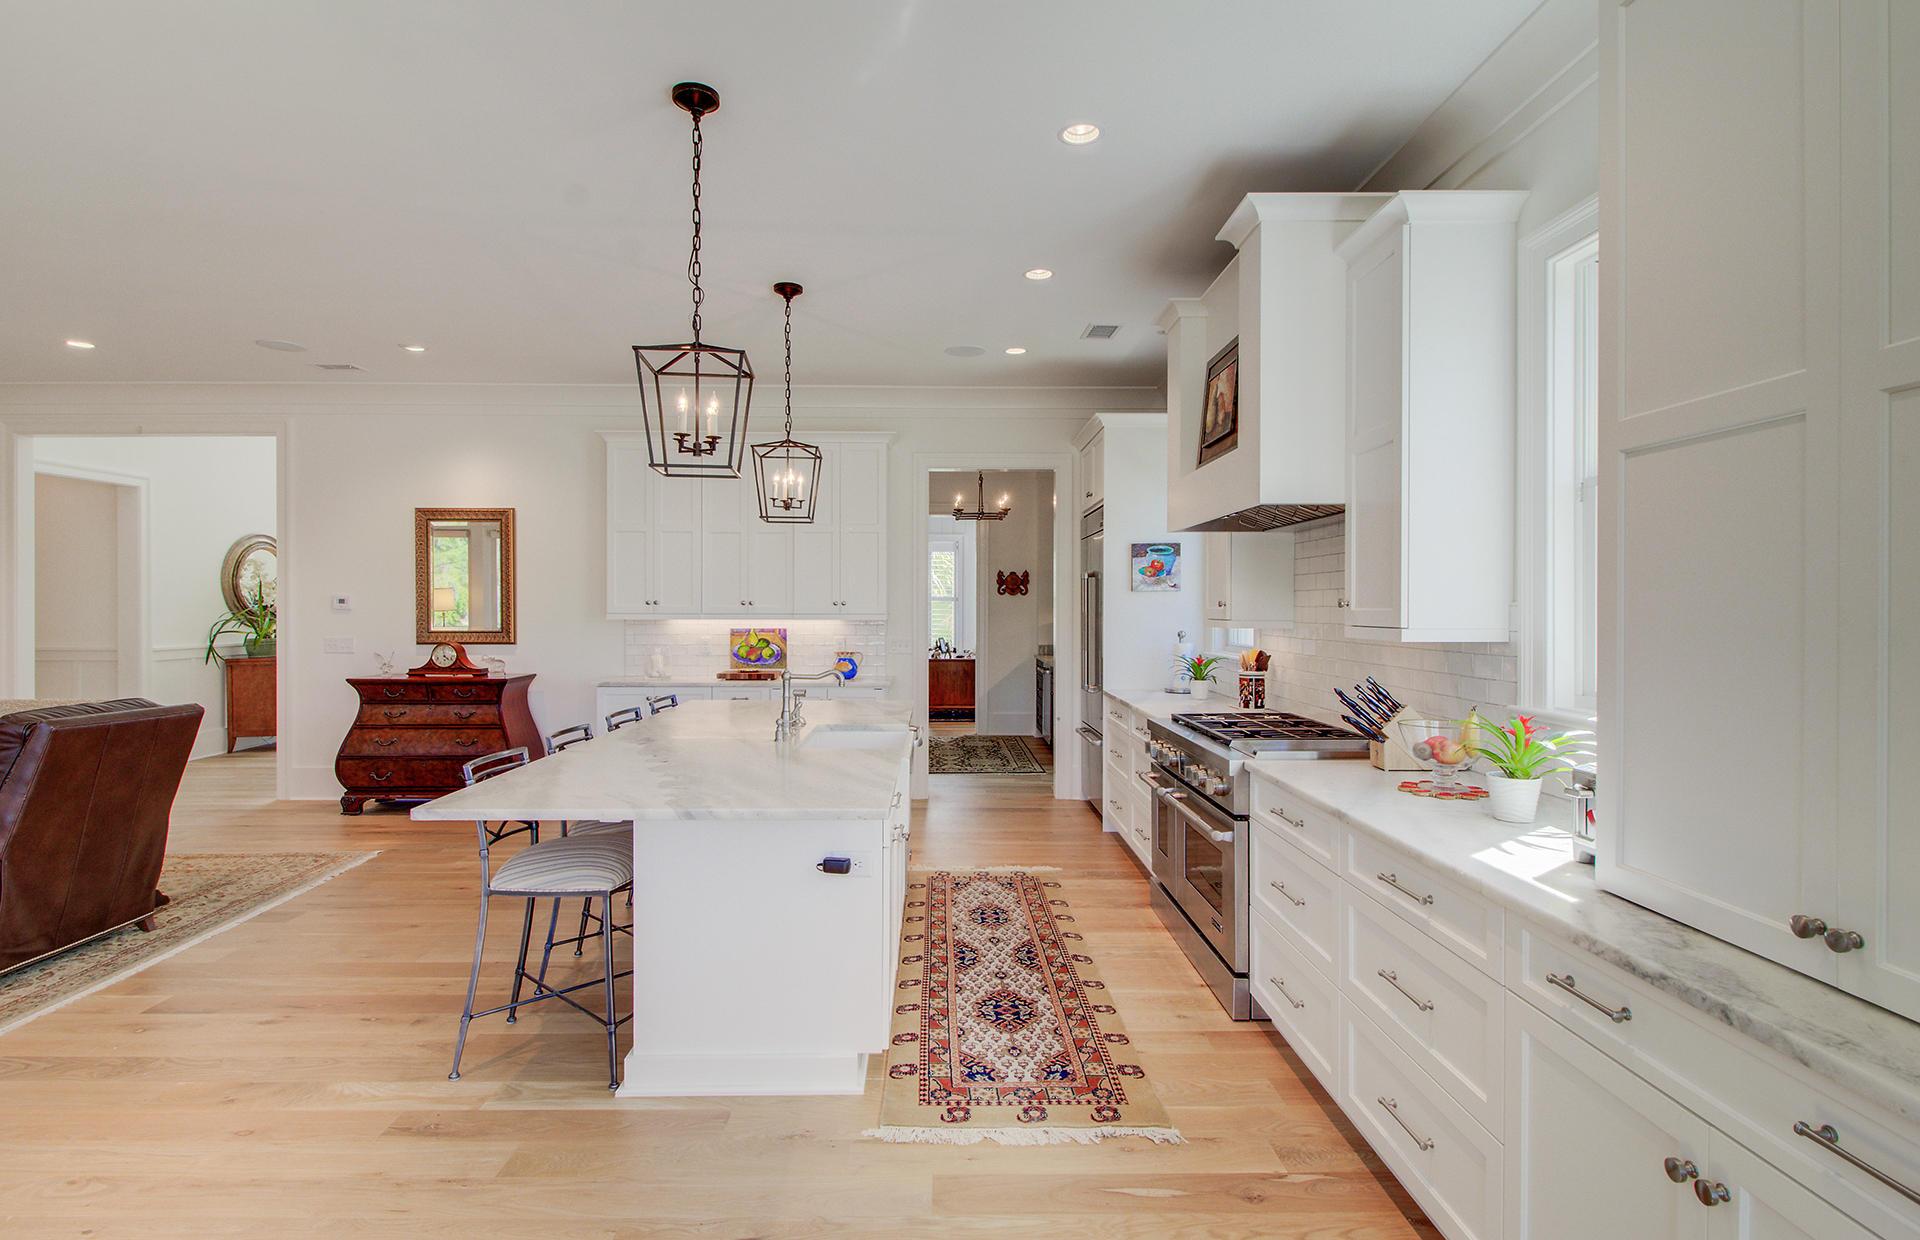 Beresford Hall Homes For Sale - 253 Grand Park, Charleston, SC - 8